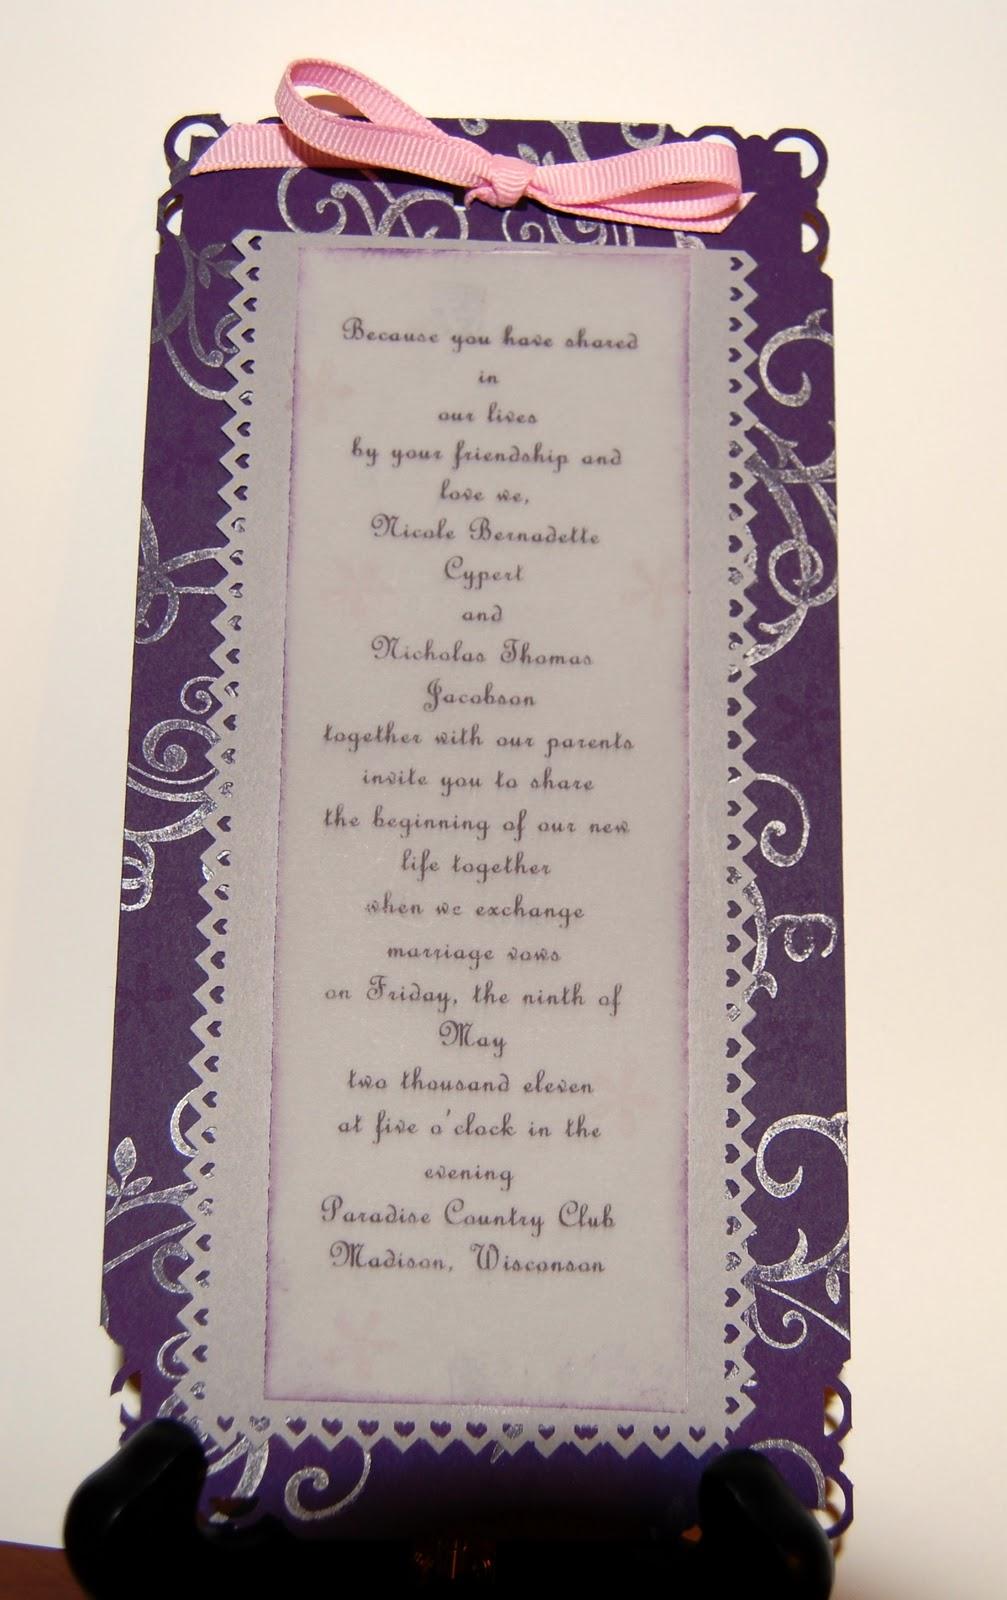 Ellegant Wedding Invitations 004 - Ellegant Wedding Invitations